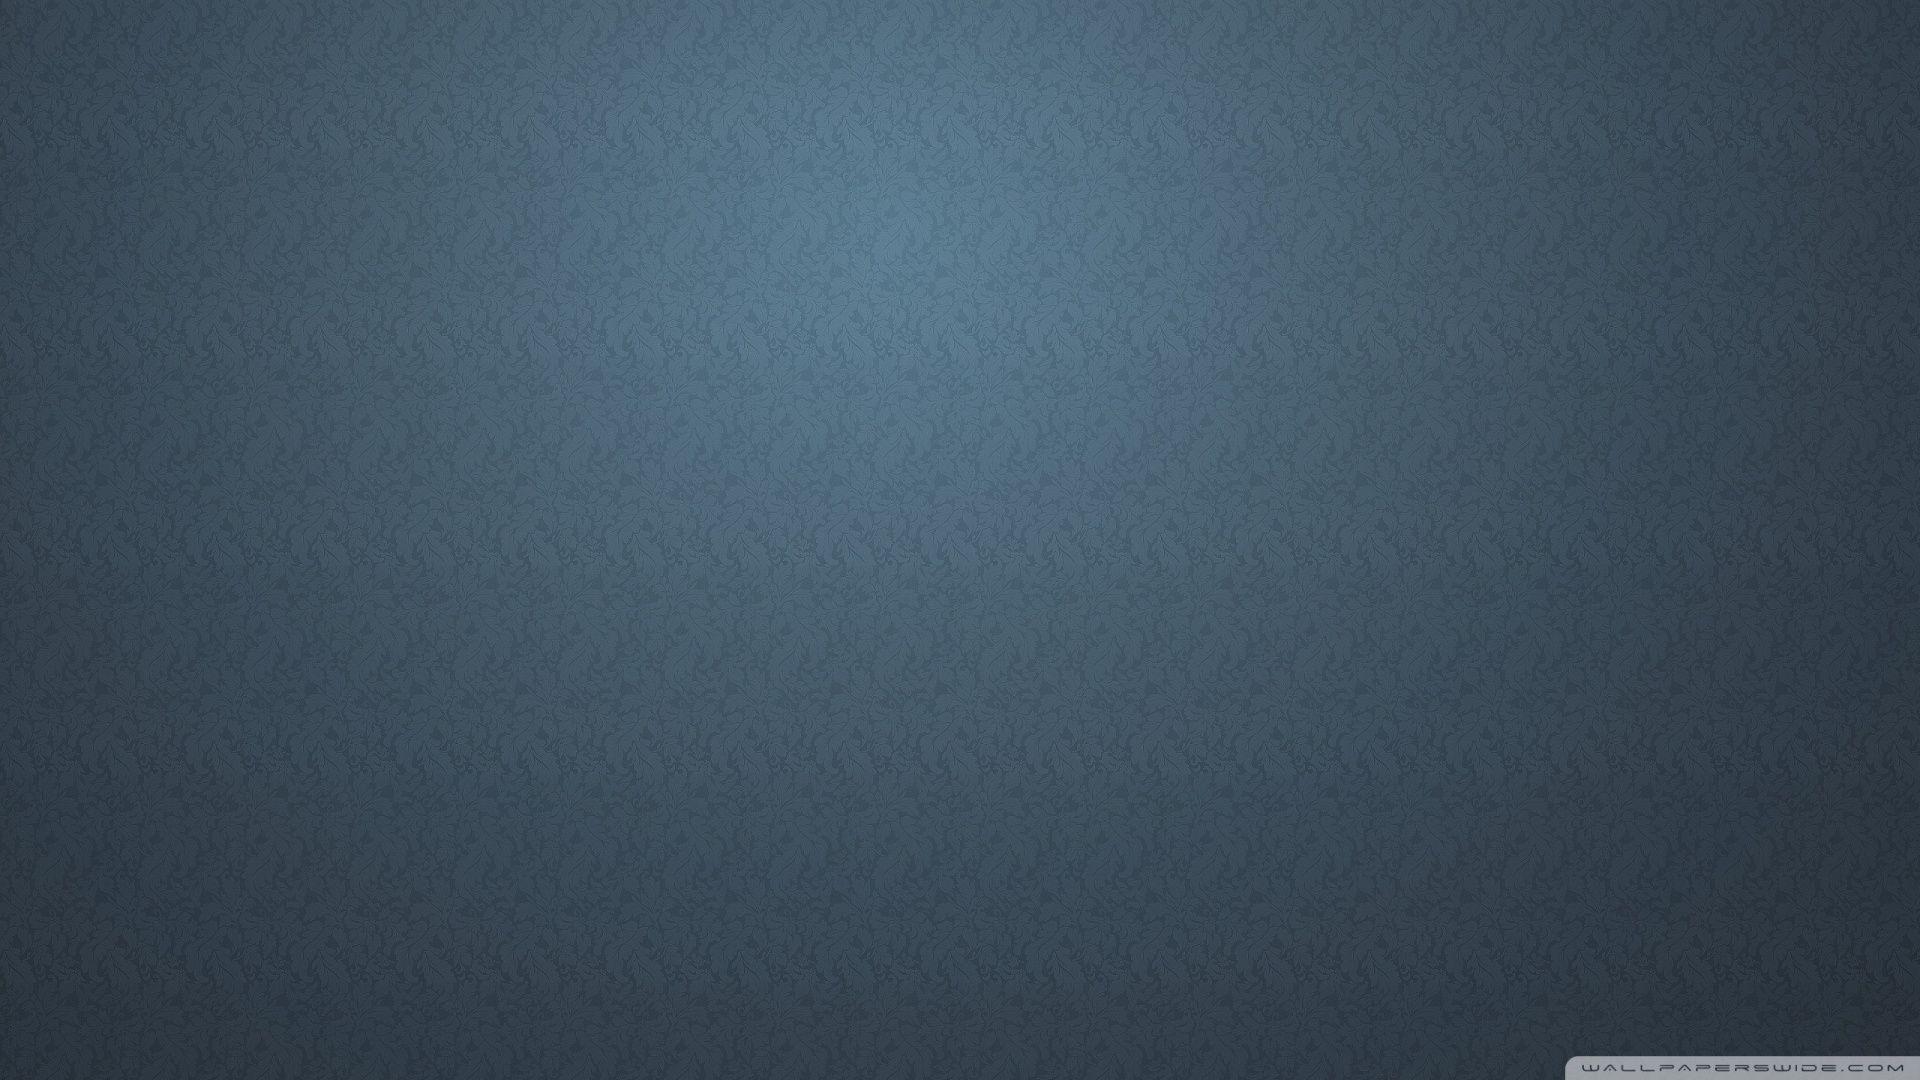 Blank Blue Wallpaper For Gadgets